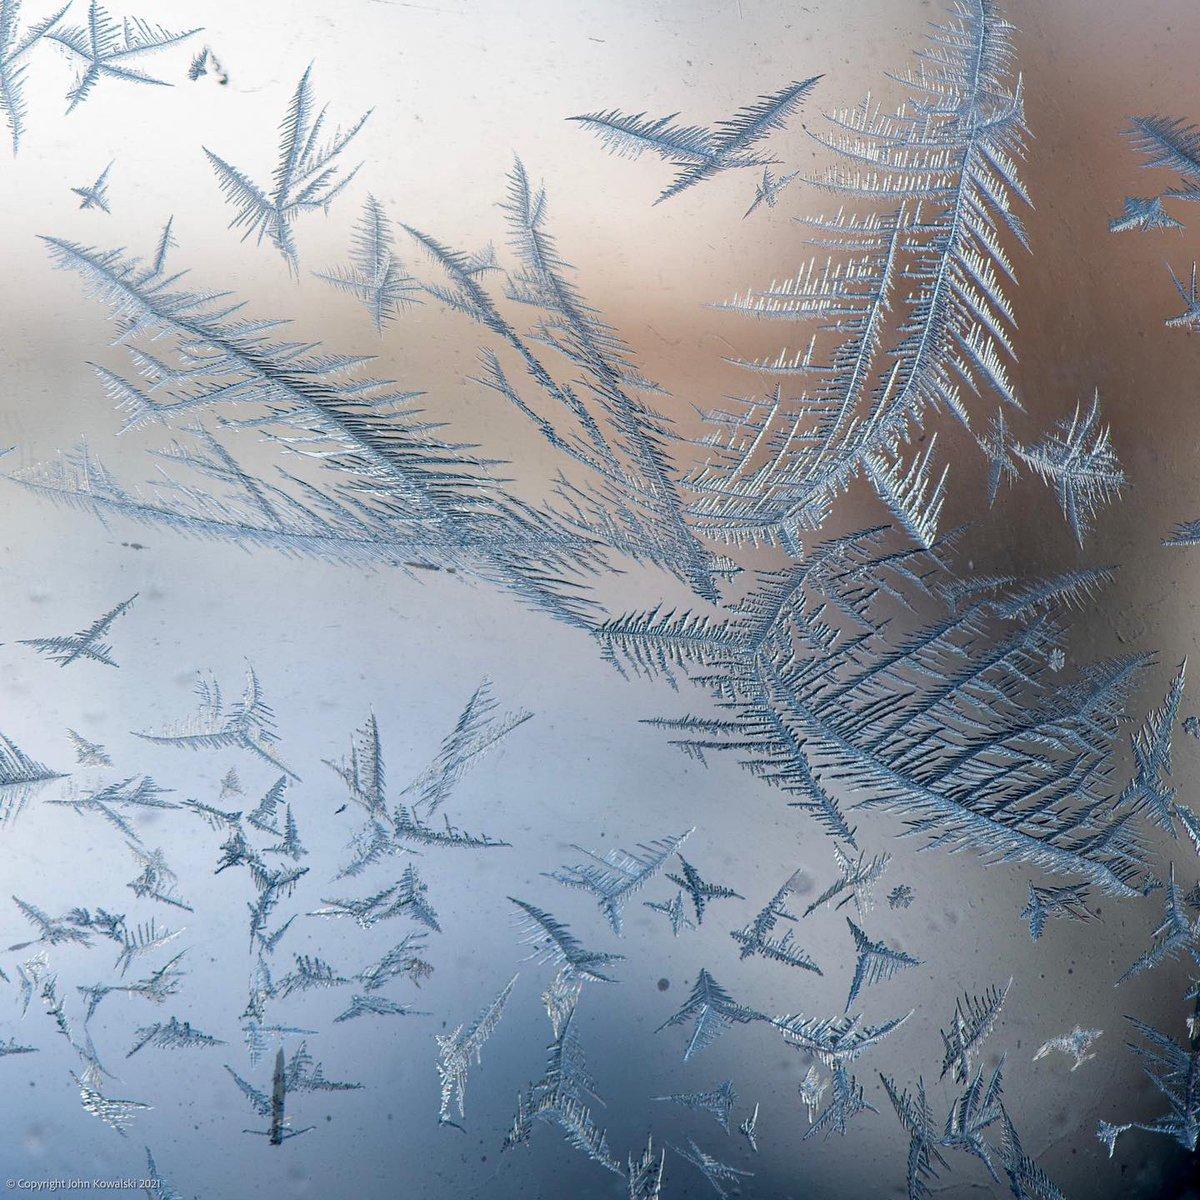 Wintertime Beauty ❄️  Second photo is 100% crop of a selected area   #ice #crystals #winter #macro #macrophotography #closeup #ottawa #canada #myottawa #instalike #instagood #instadaily #nikon #nikoncanada #shotonnikon  #nikond850 #d850